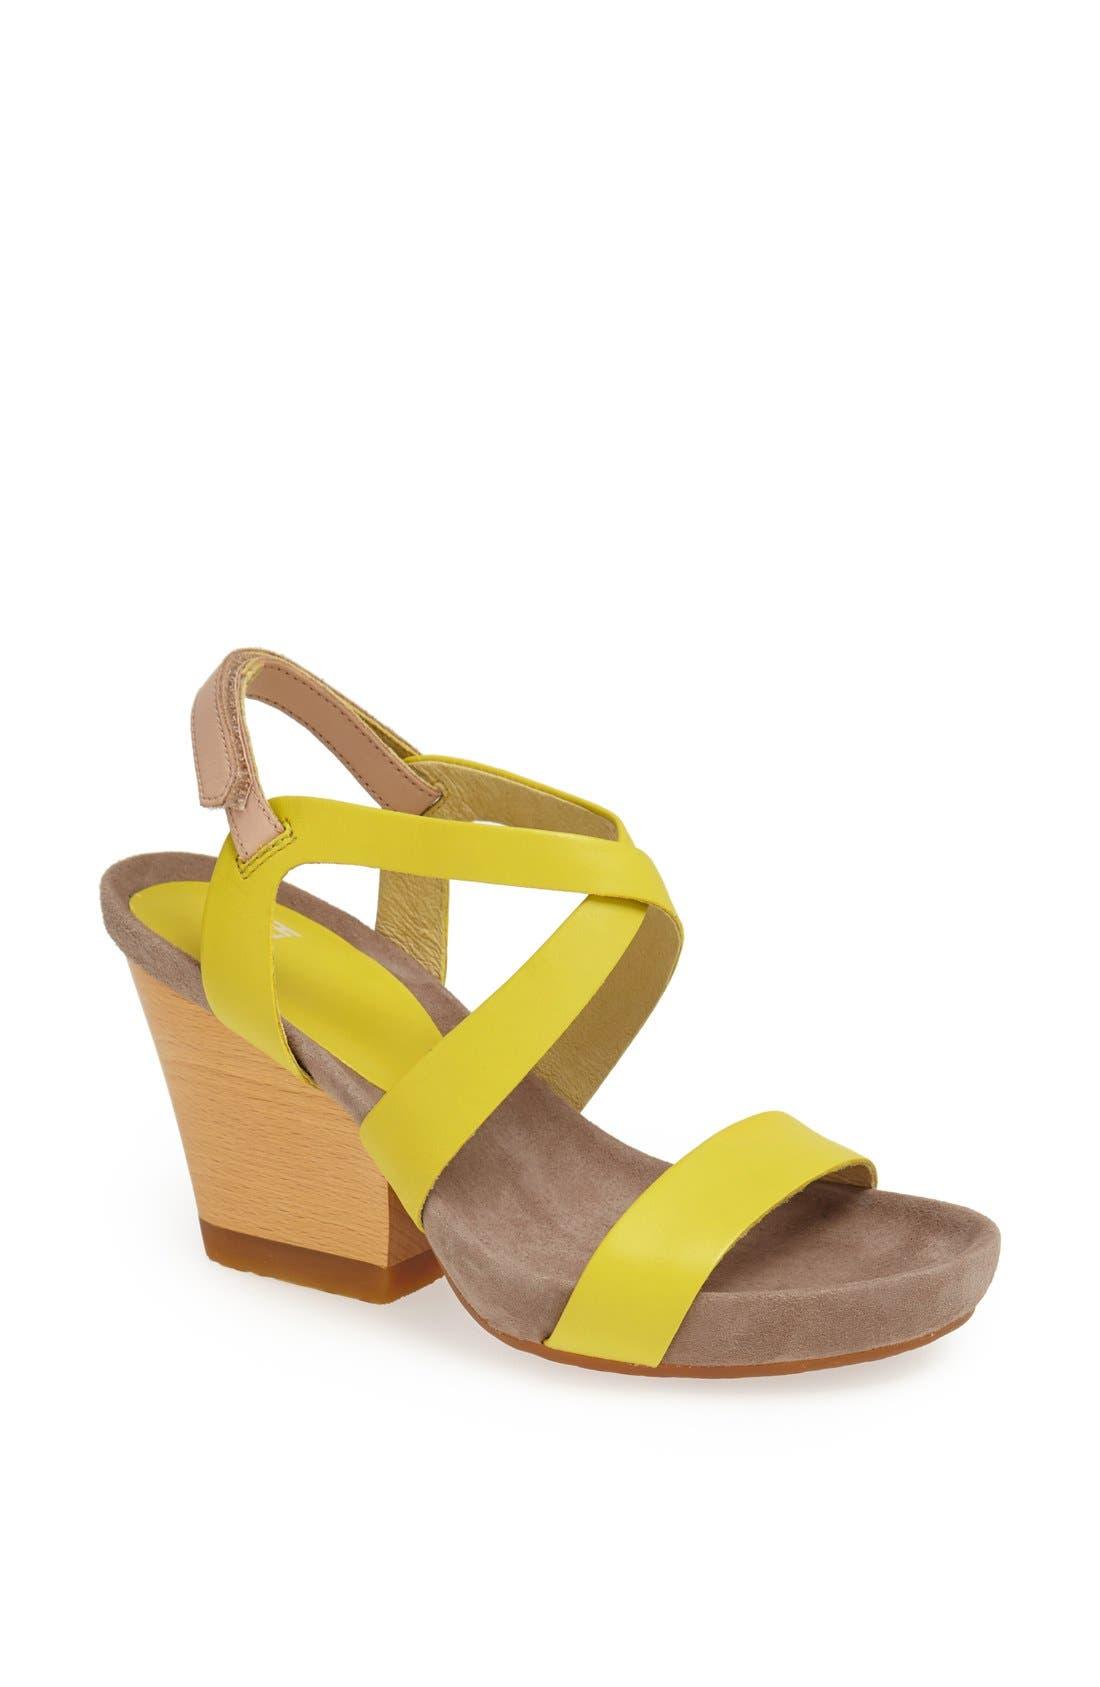 Main Image - Camper 'Allegra' Block Heel Sandal